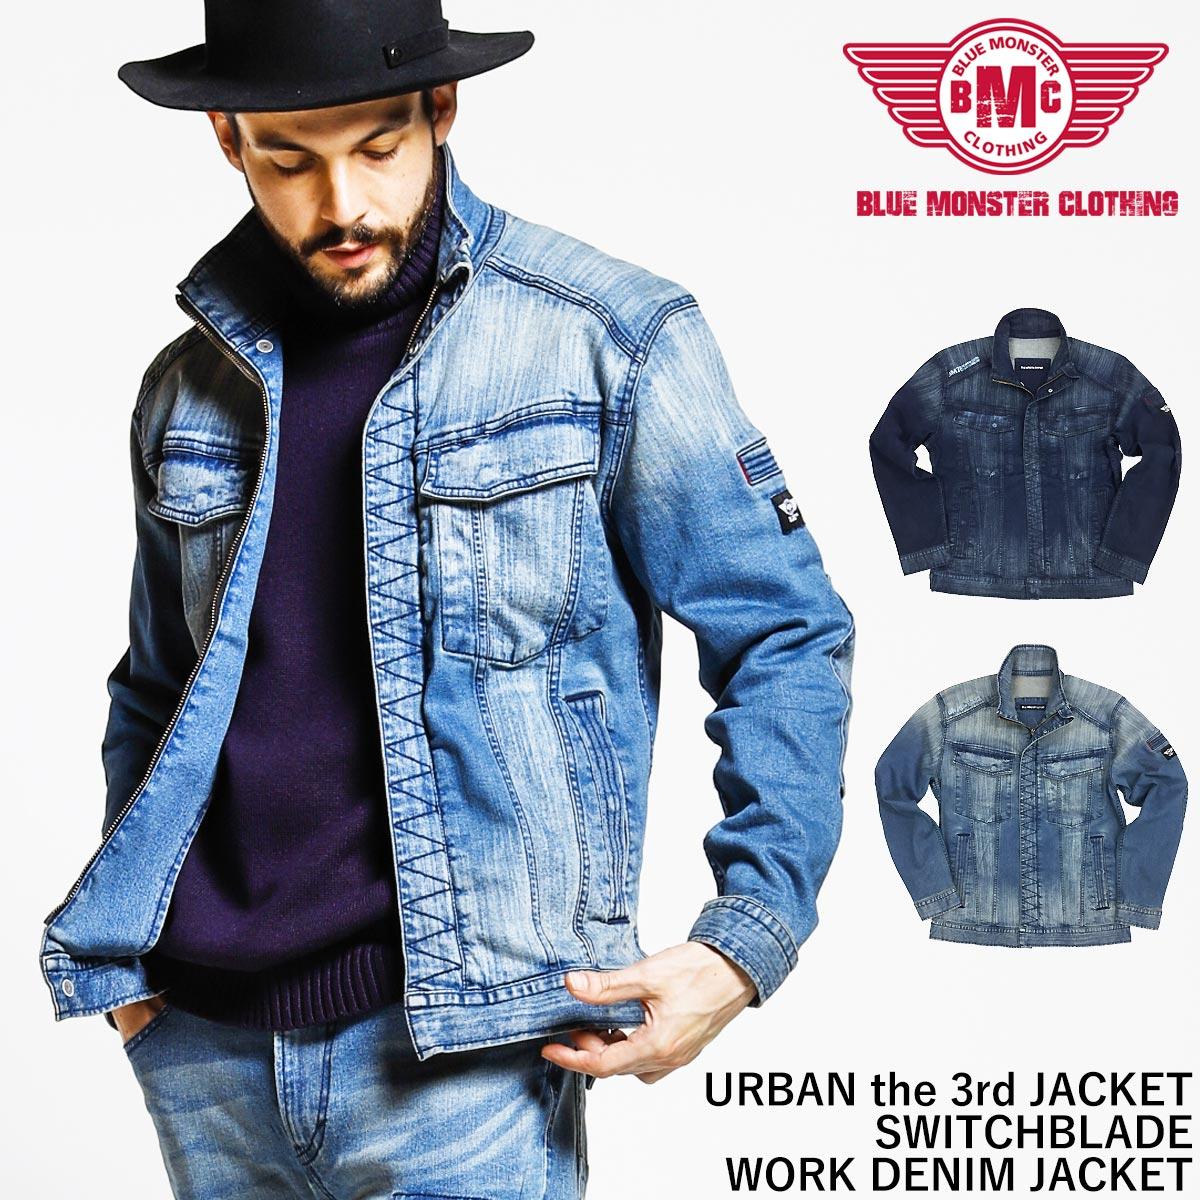 3260ee6896d BMC blue monster closing work jacket stretch denim Urban 3rd jacket men  denim jacket U03W switch blade processing dark blue   light blue S-5L